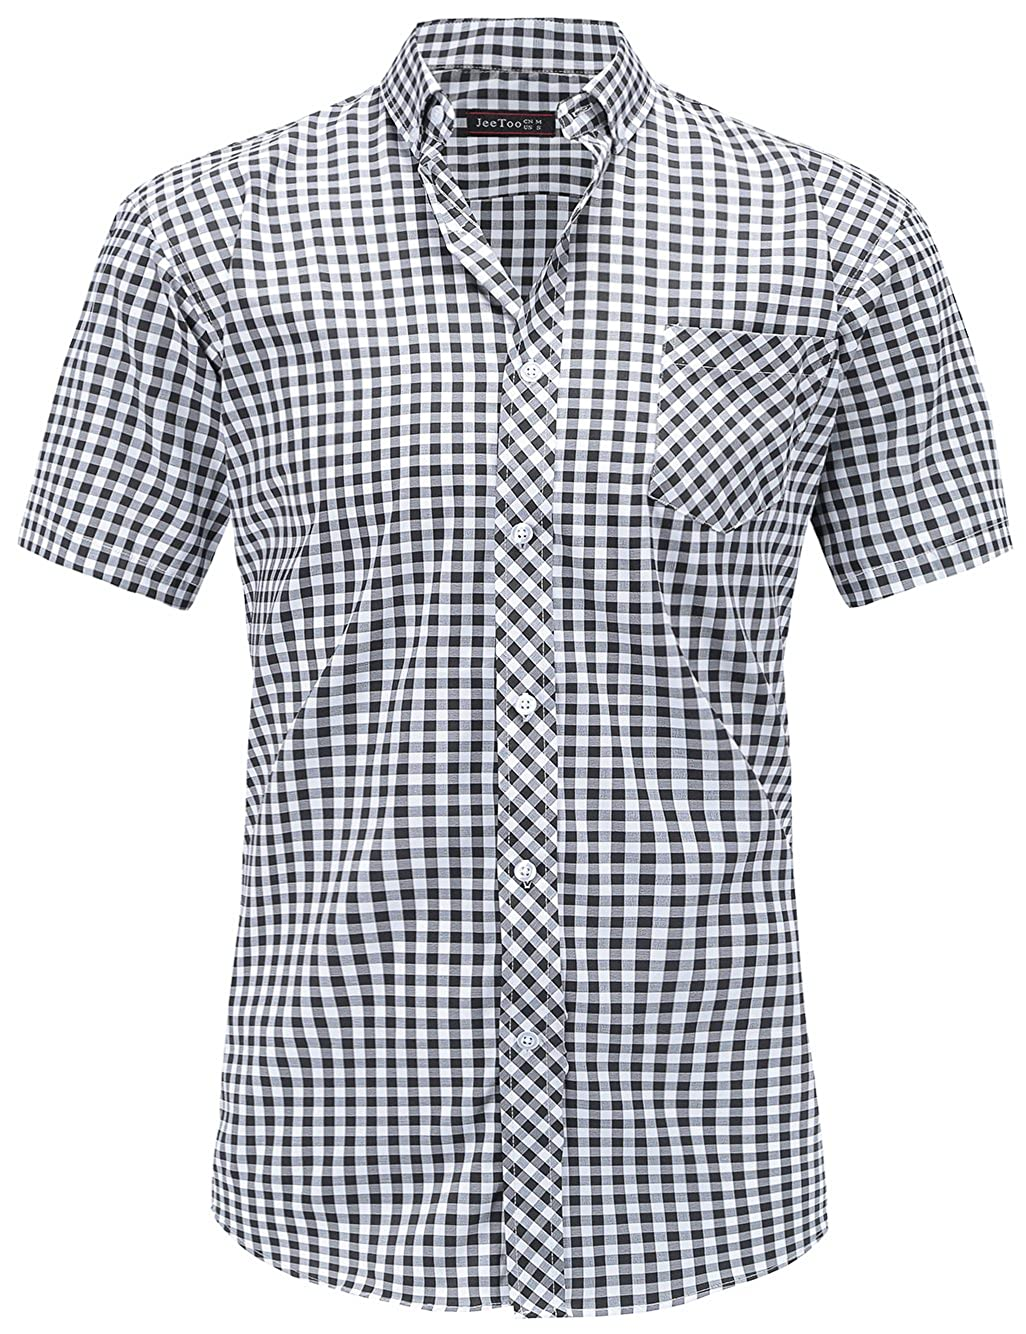 TALLA XL. JEETOO Camisa Casual a Cuadros Manga Corta para Hombre